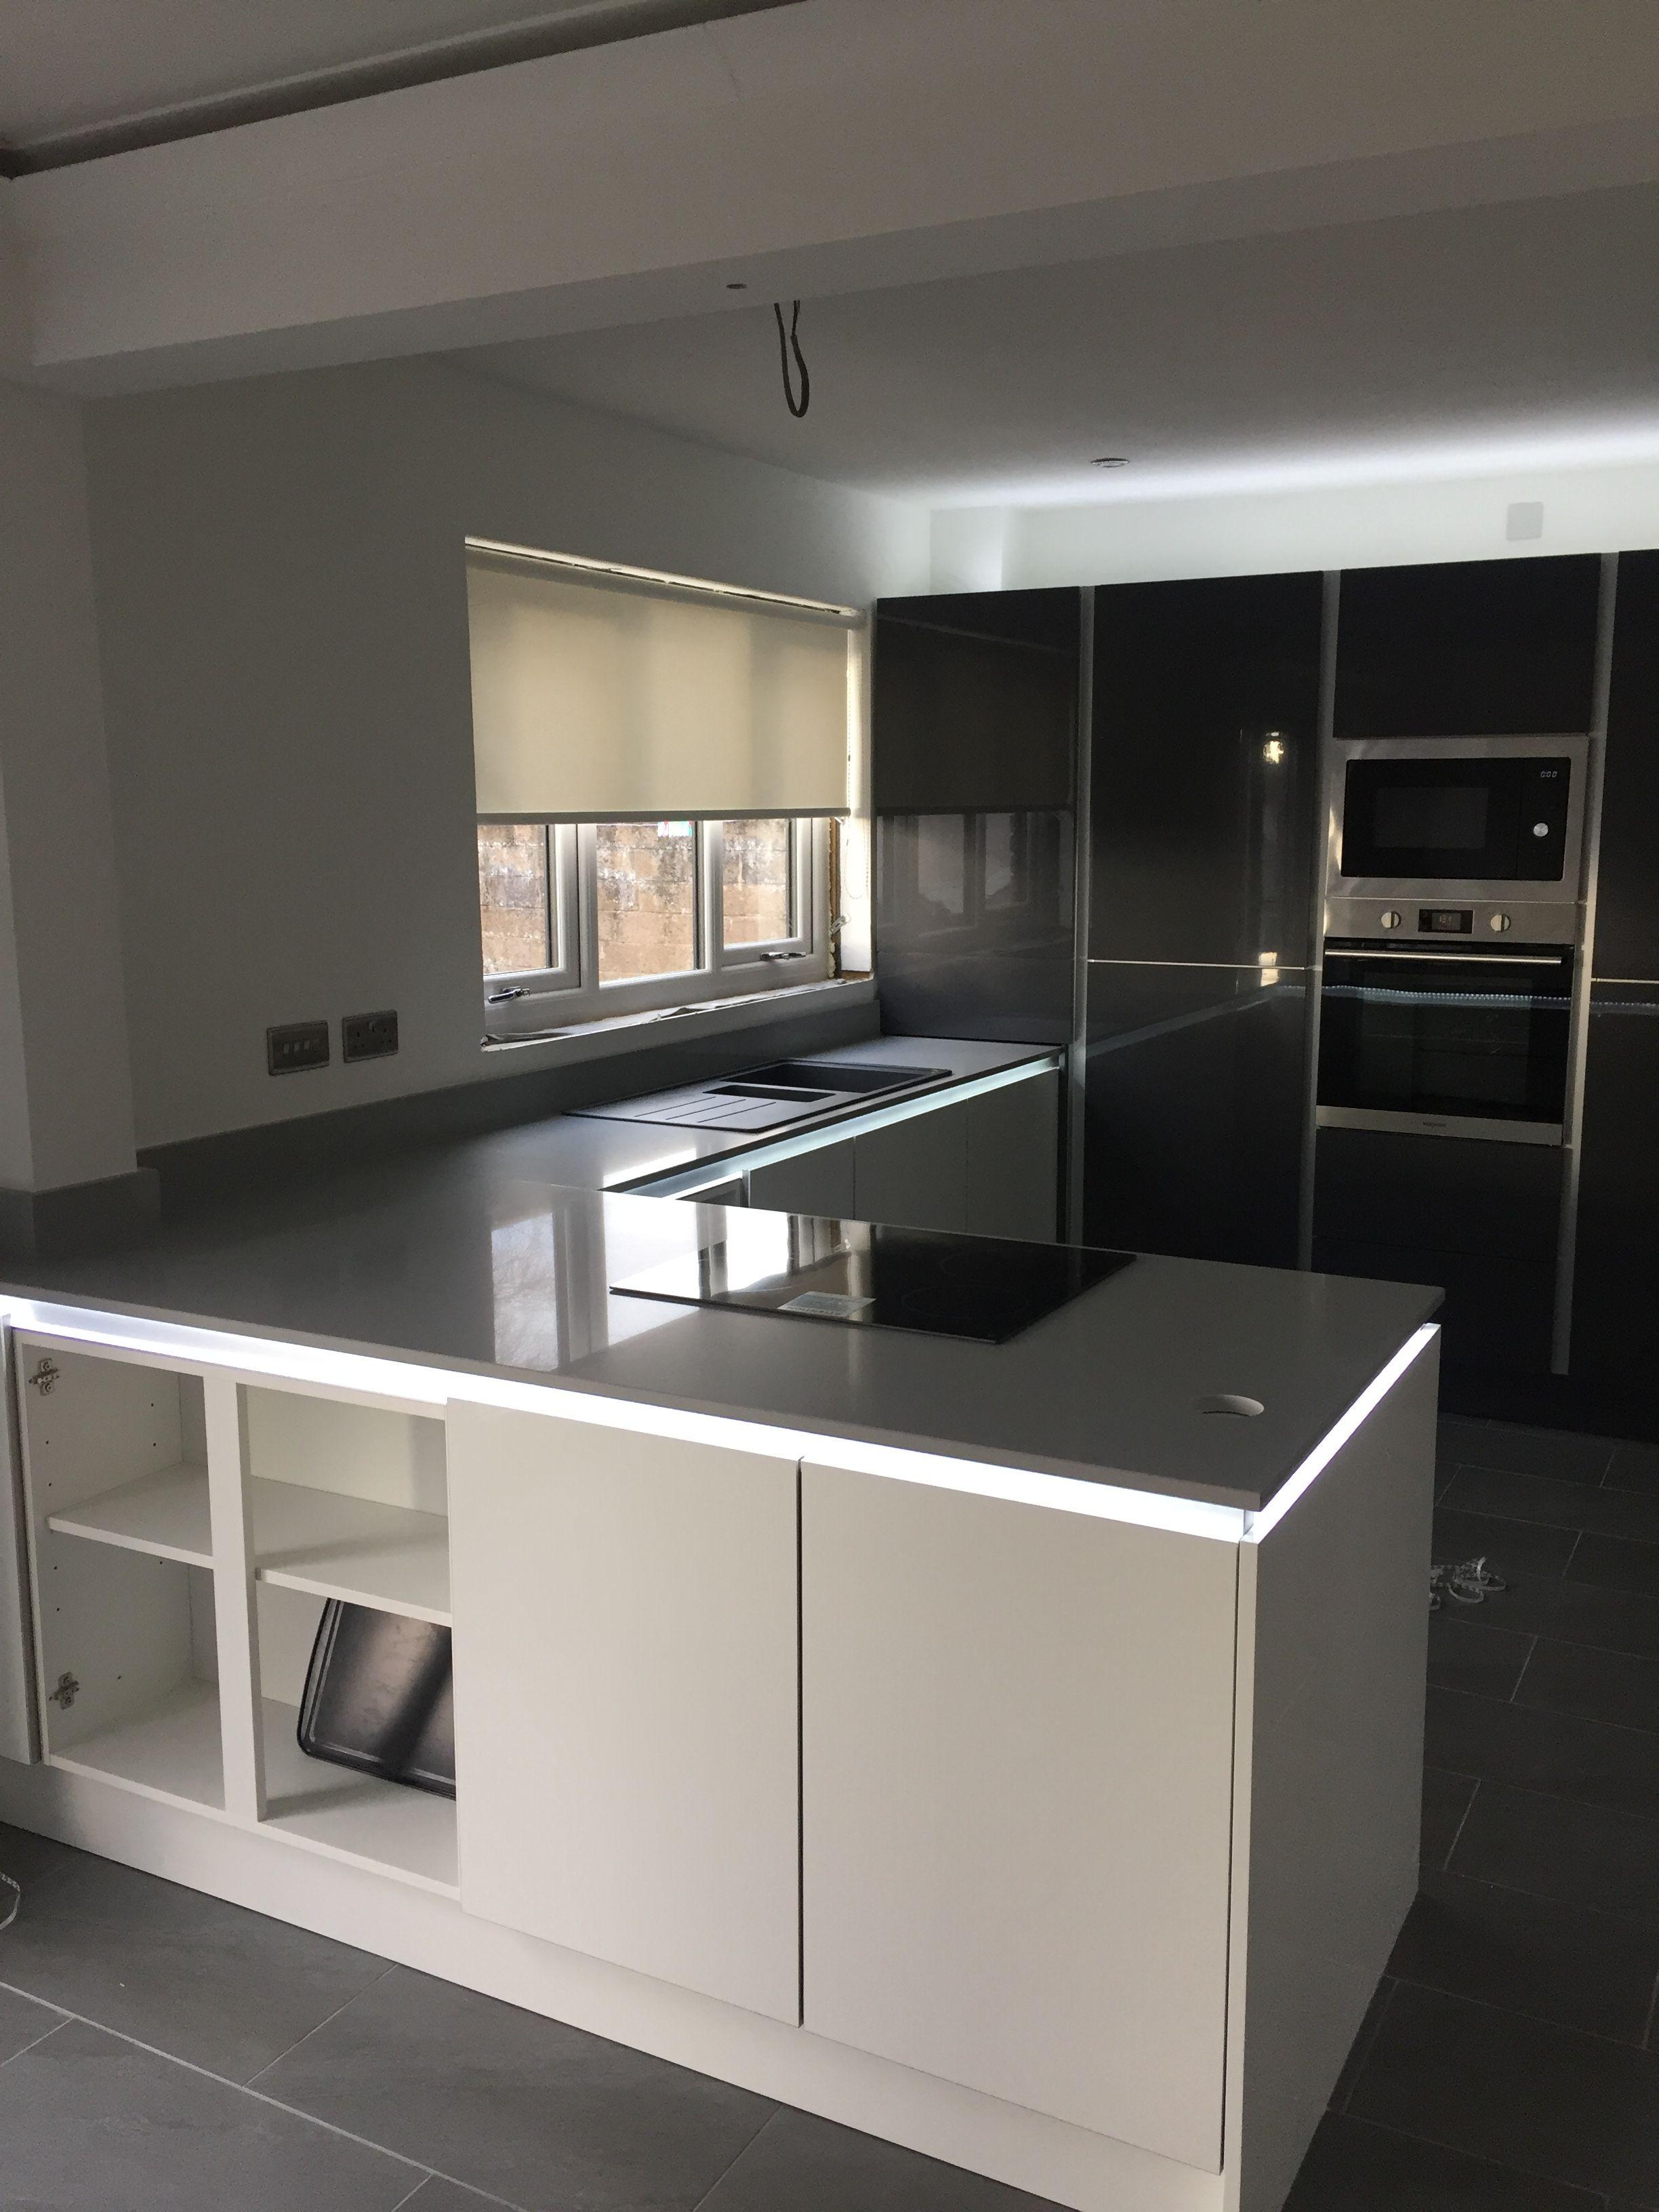 True Handless Kitchen With Hidden Leds Lights Under Worktops